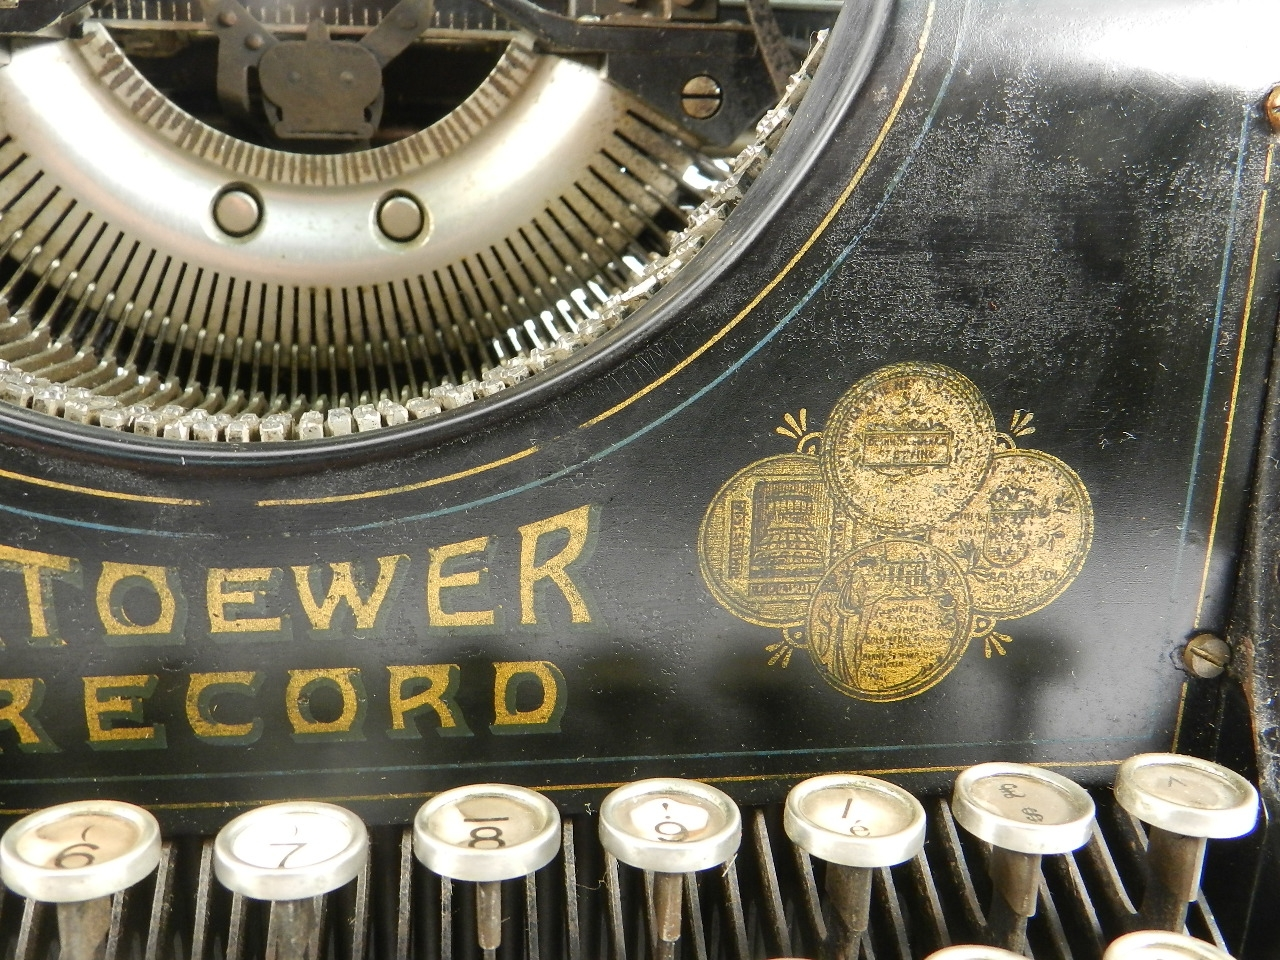 Imagen STOEWER RECORD AÑO 1910 32619